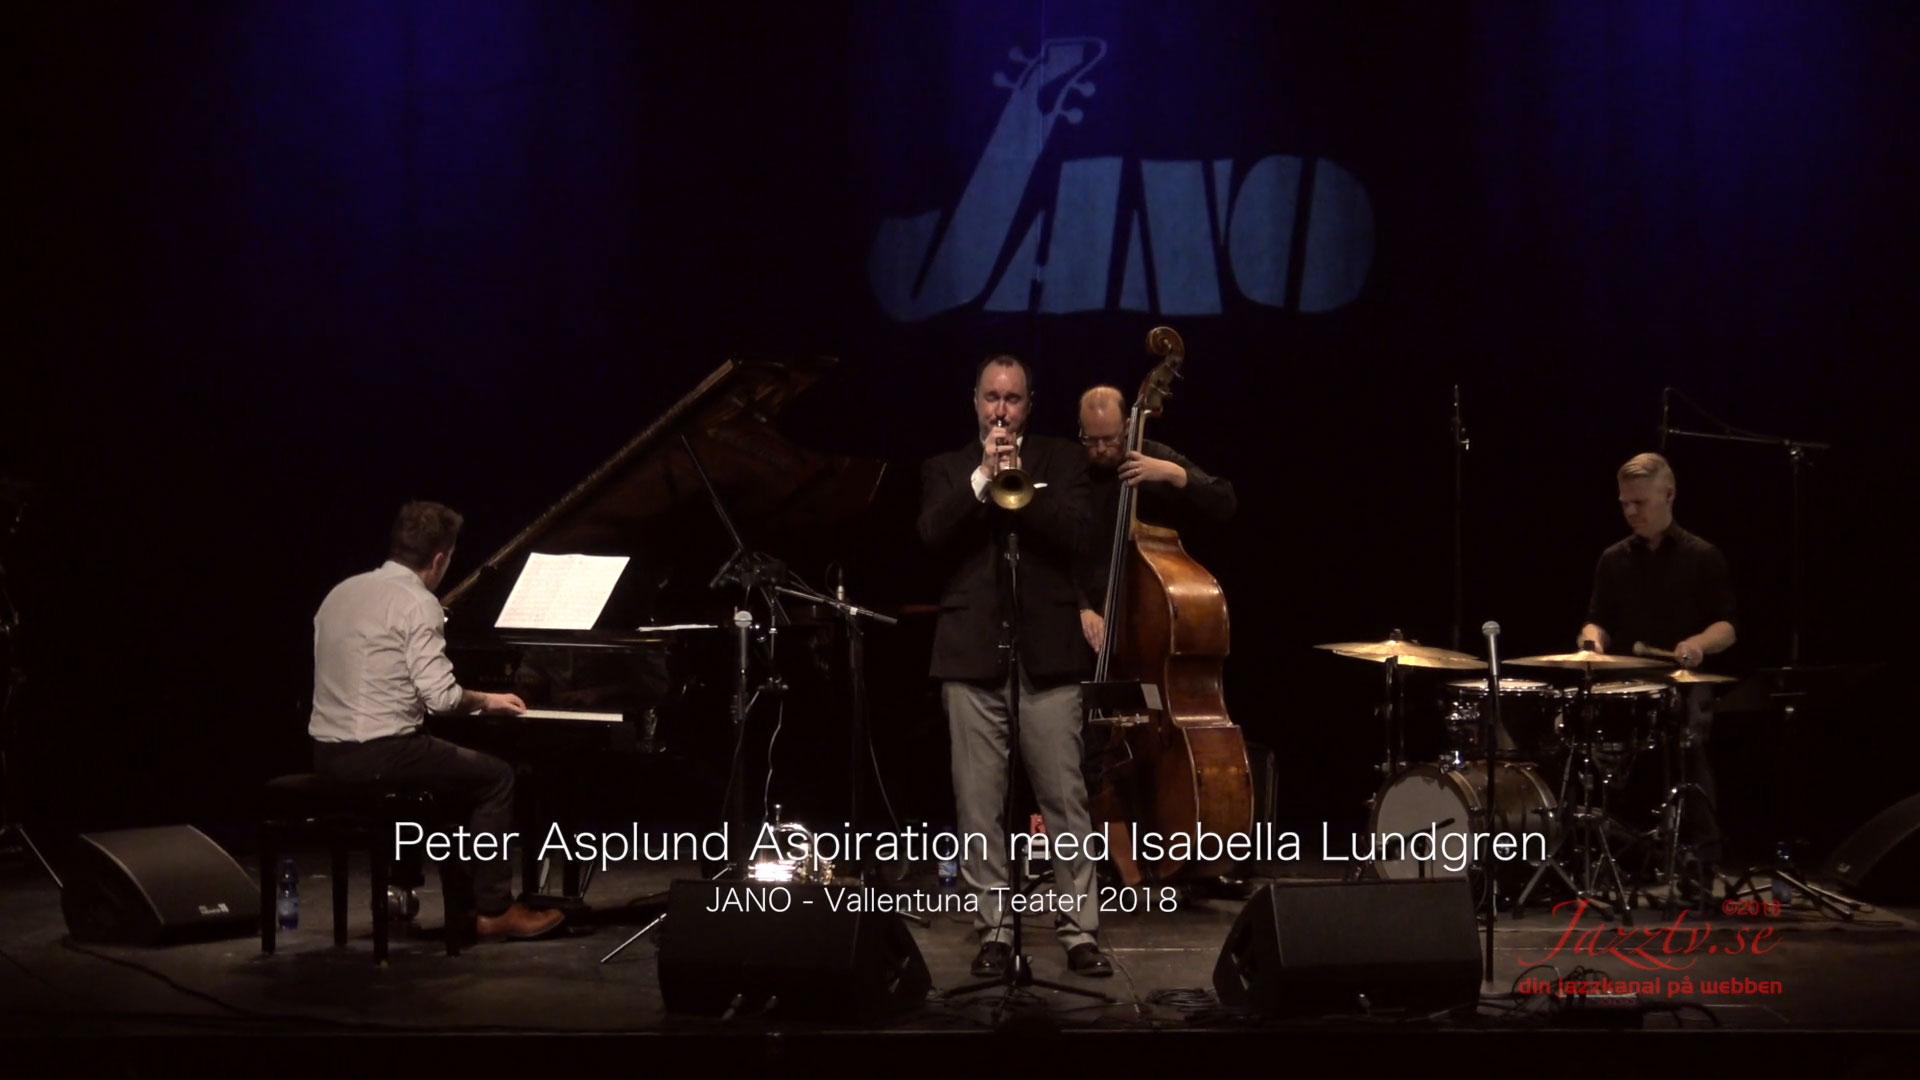 Peter Asplund Aspiration med Isabella Lundgren